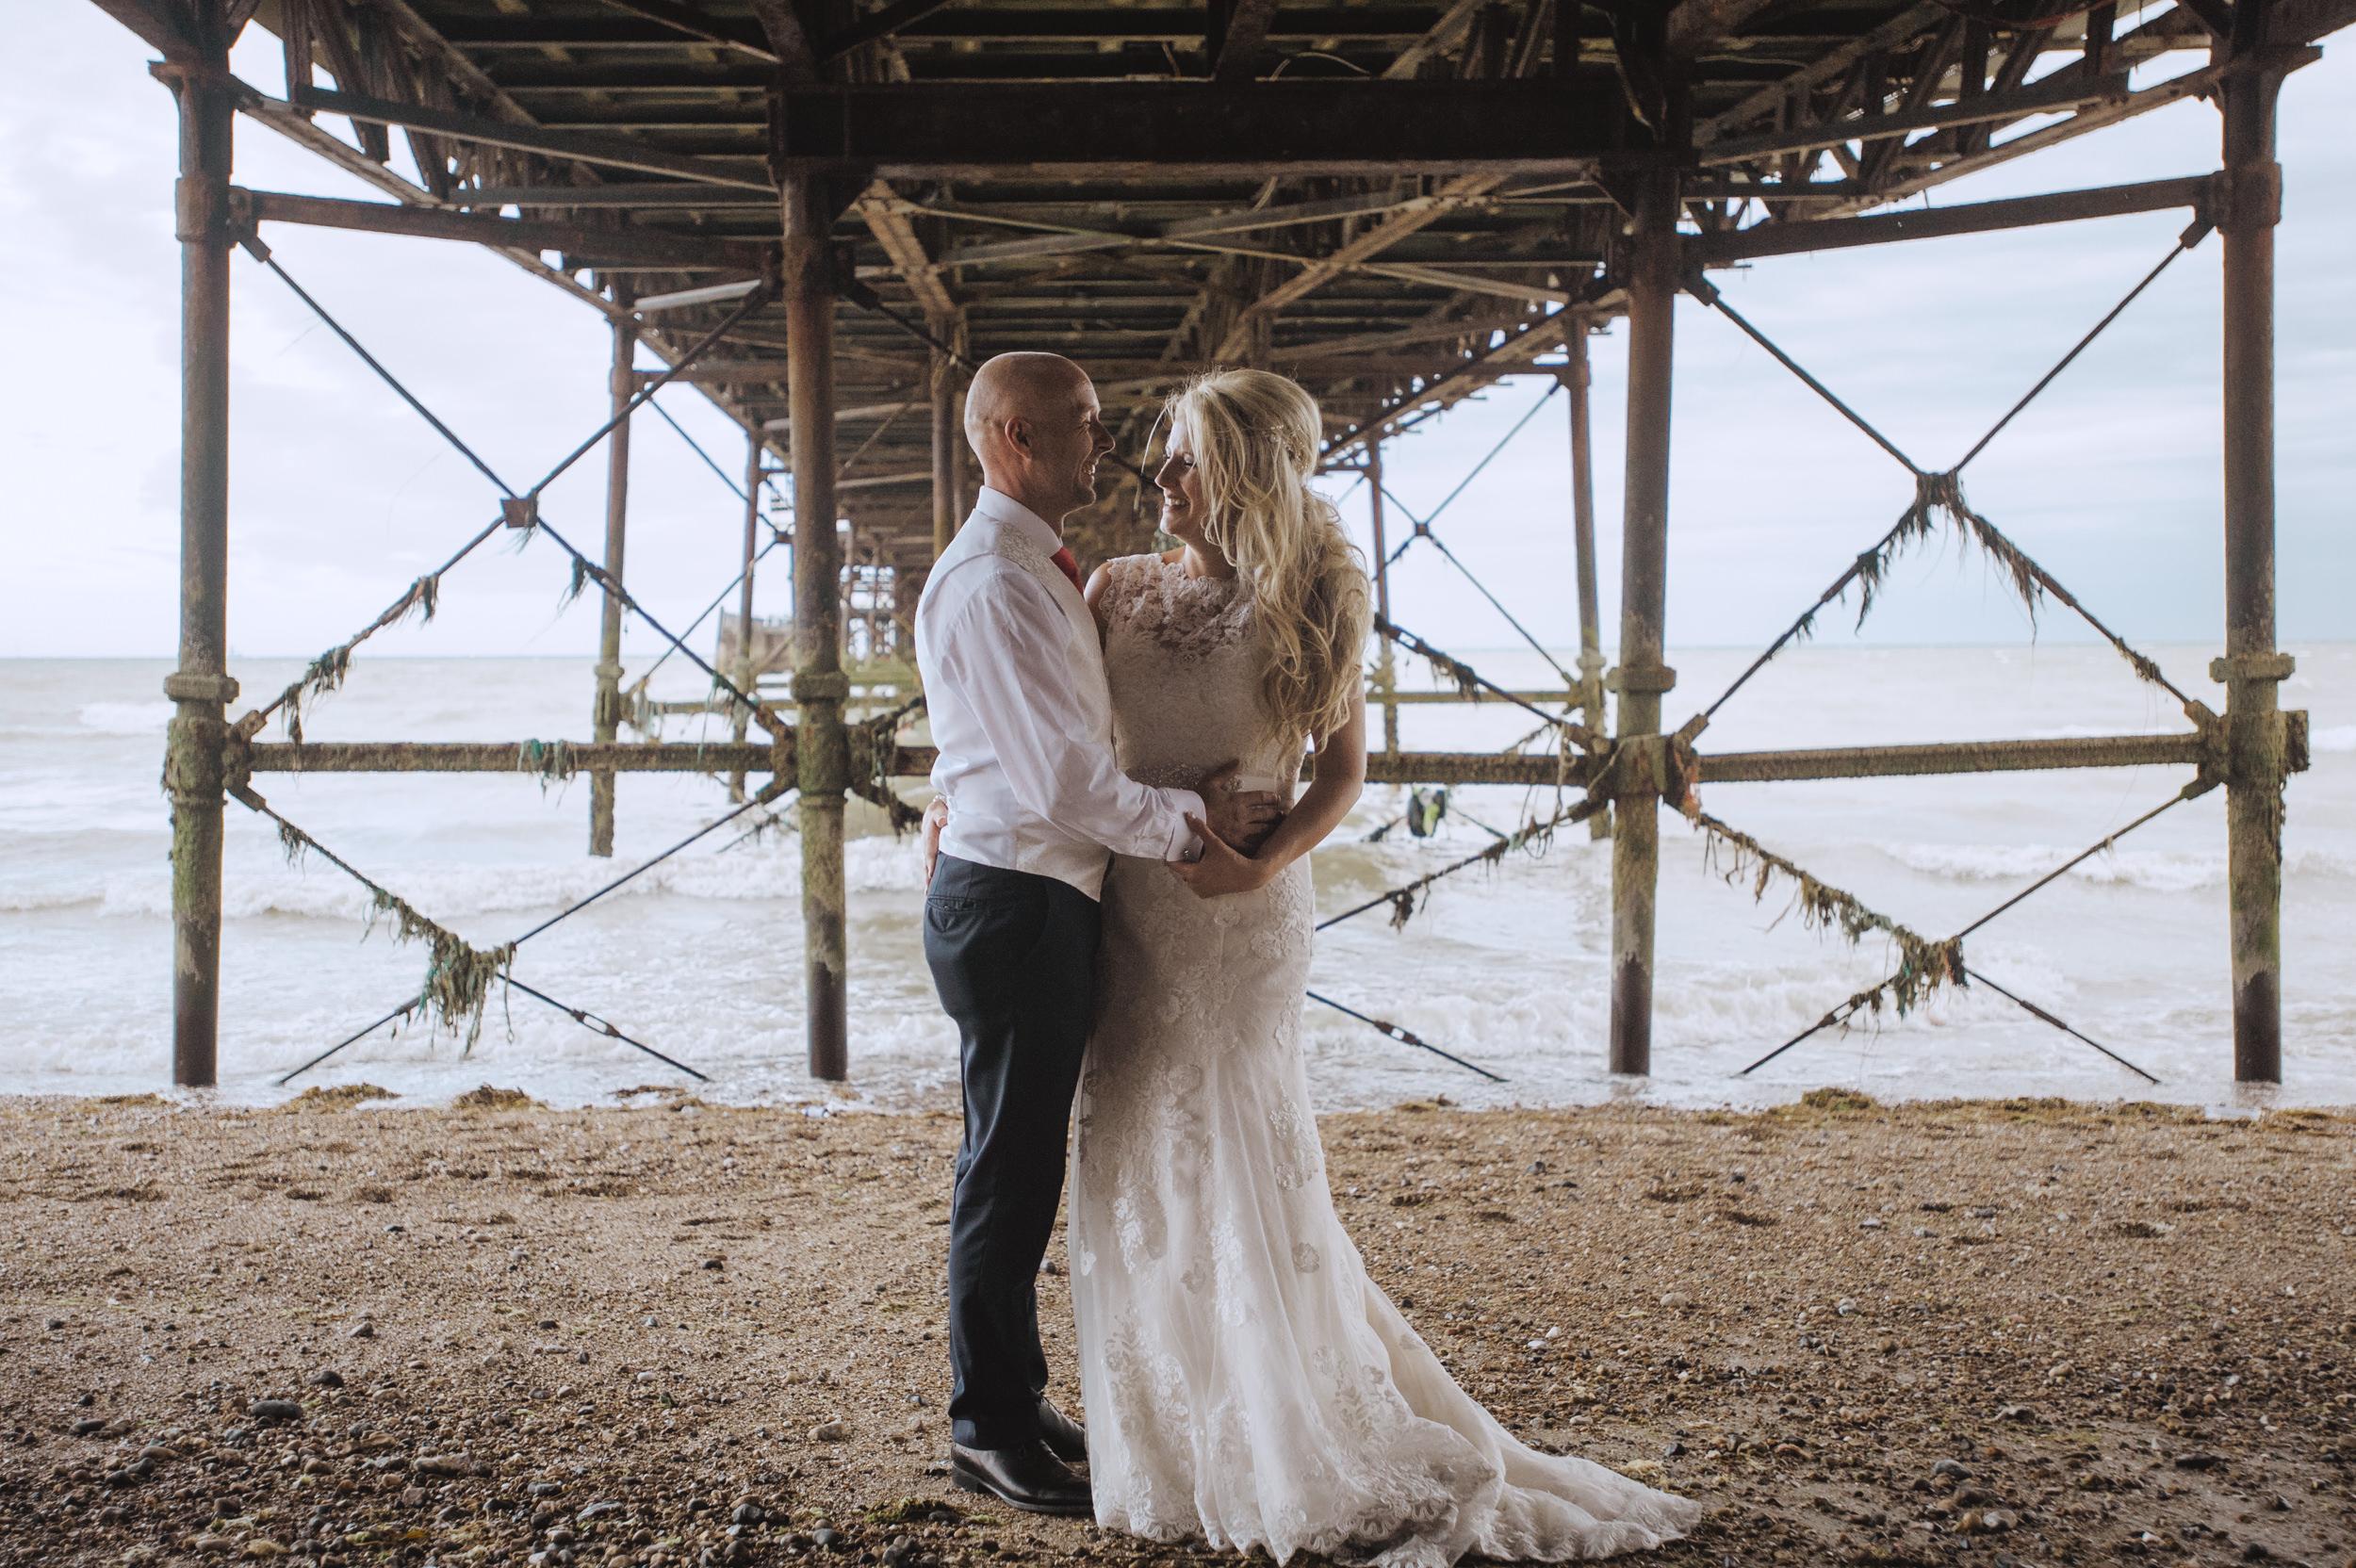 worthing-pier-wedding-011.JPG